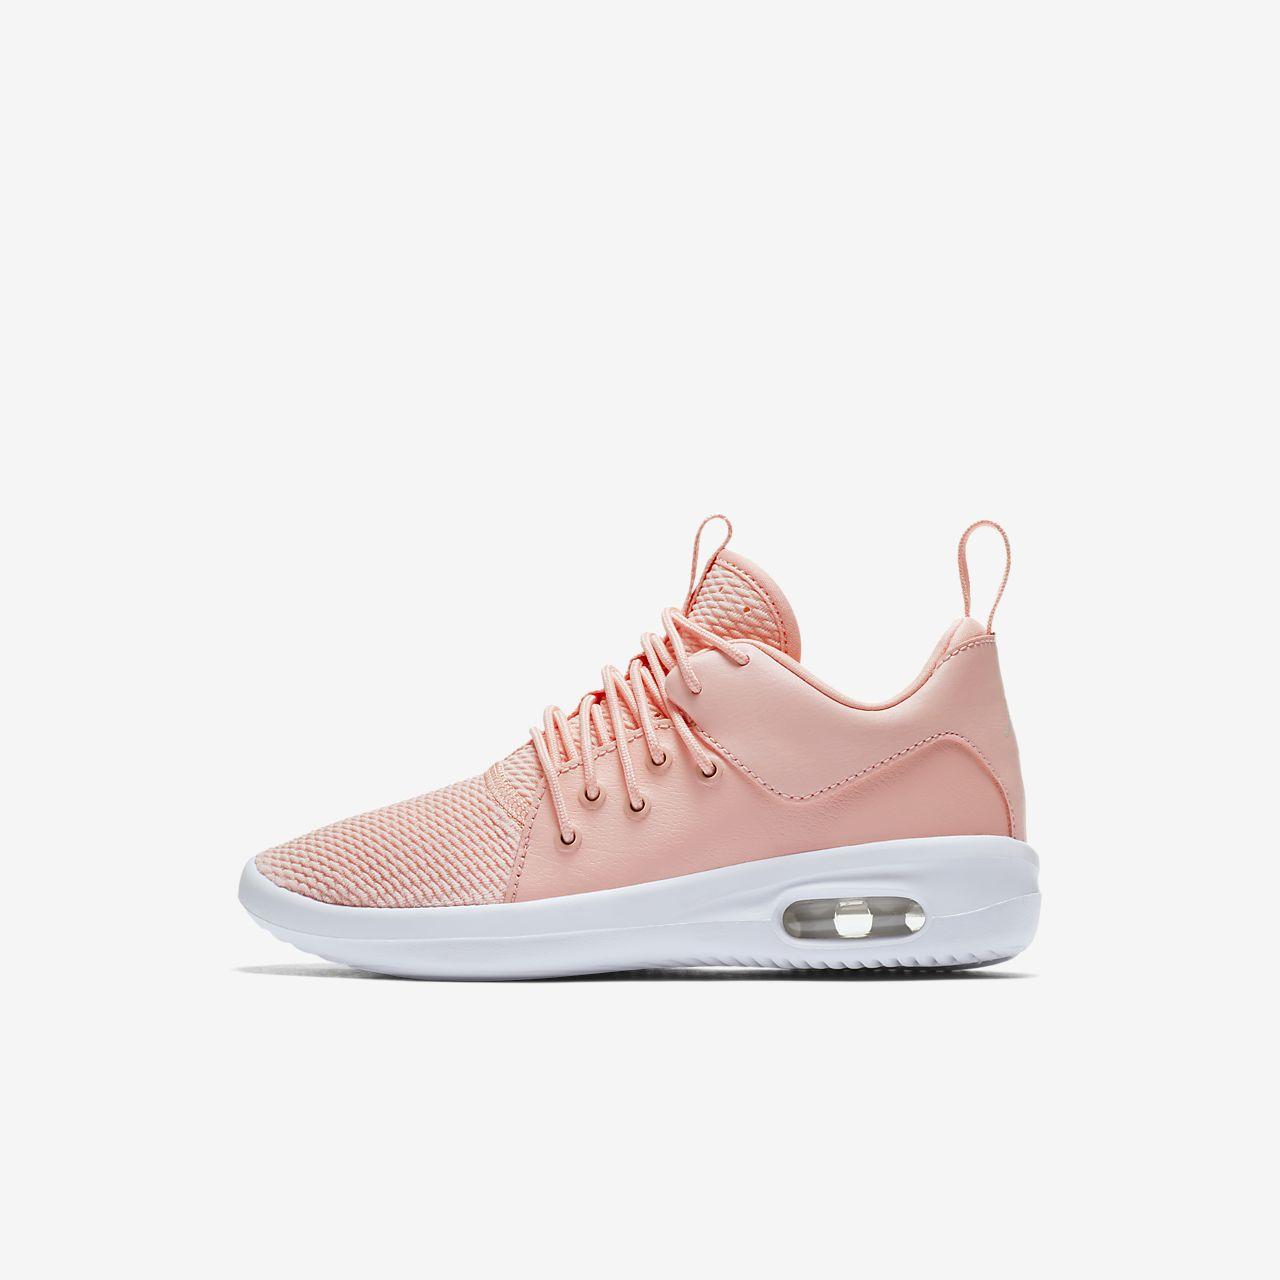 air jordan little kids shoes